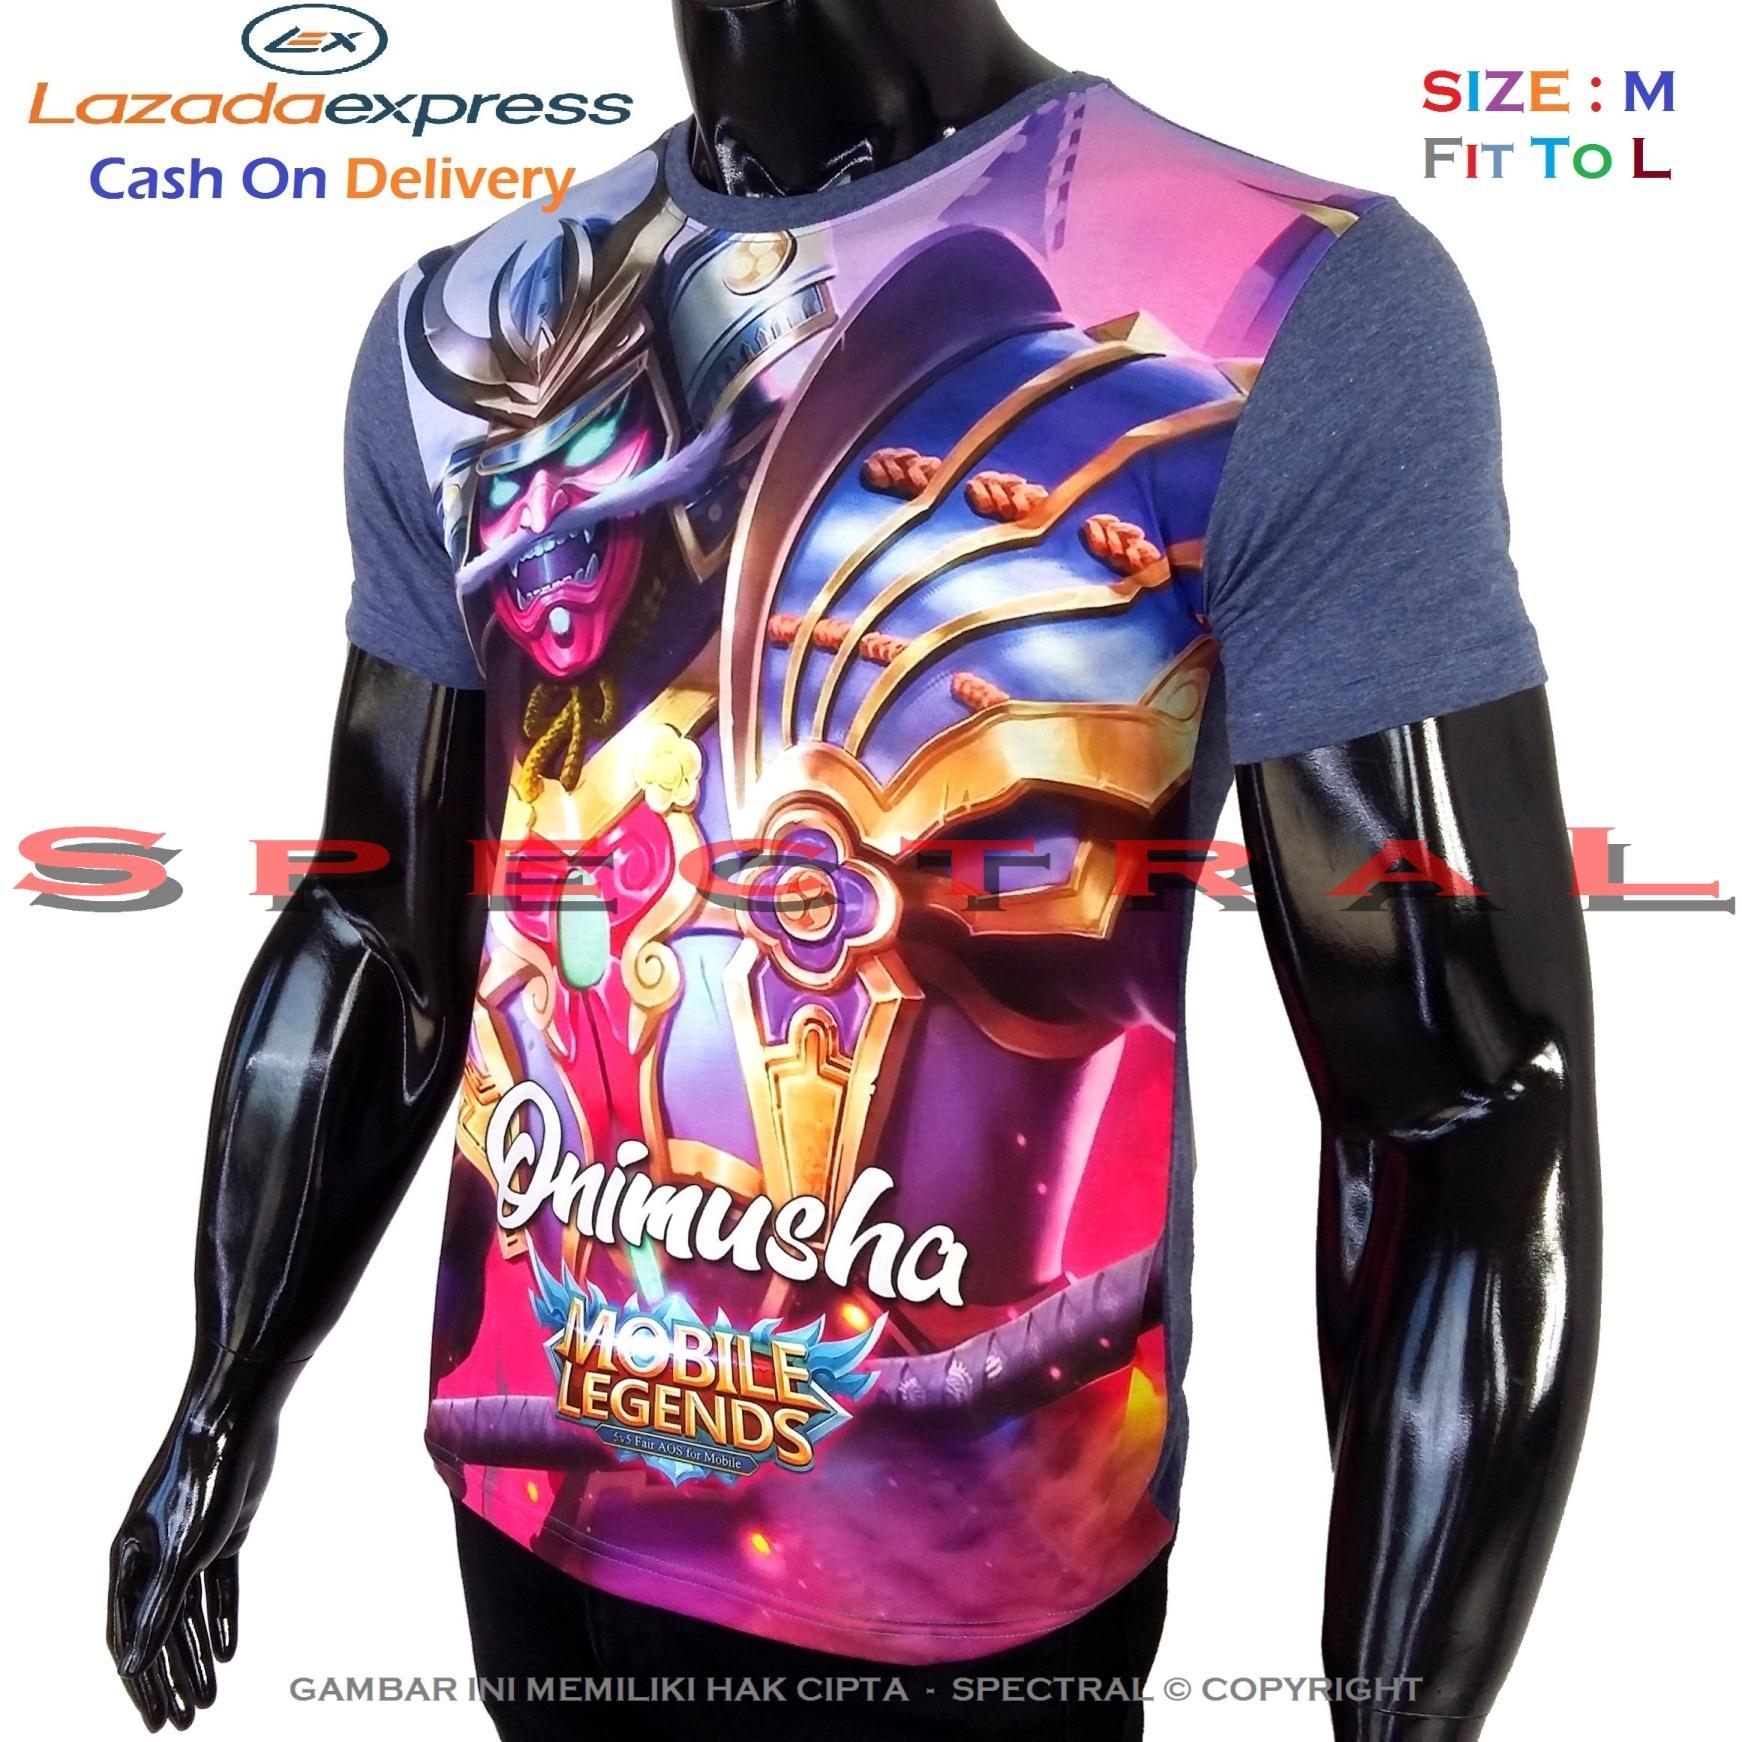 Spectral – 3D ONIMUSHA Mobile Legend Kualitas HD Printing Size M Fit To L Soft Rayon Kaos Distro Fashion T-Shirt Atasan Baju Pakaian Polos Pria Wanita Cewe Cowo Lengan Murah Bagus Keren Jaman Kekinian Jakarta Bandung Gambar Game Mobilelegend Legends Japan